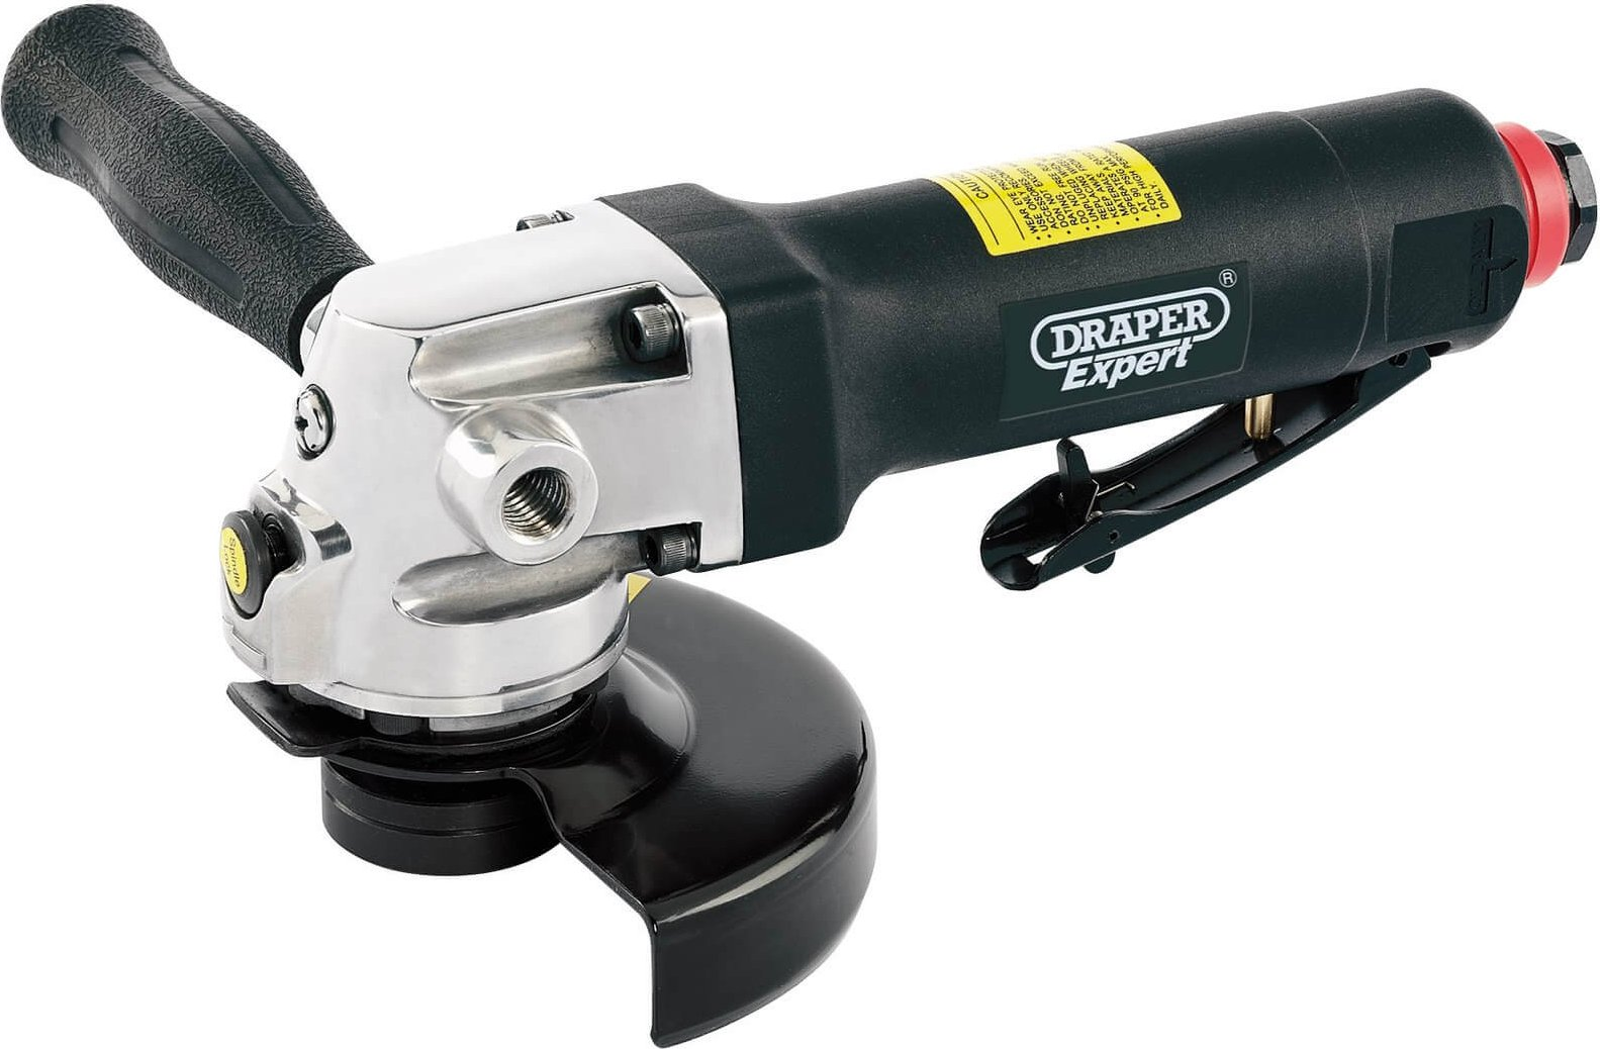 Draper Expert 5228PRO Air Angle Grinder 115mm